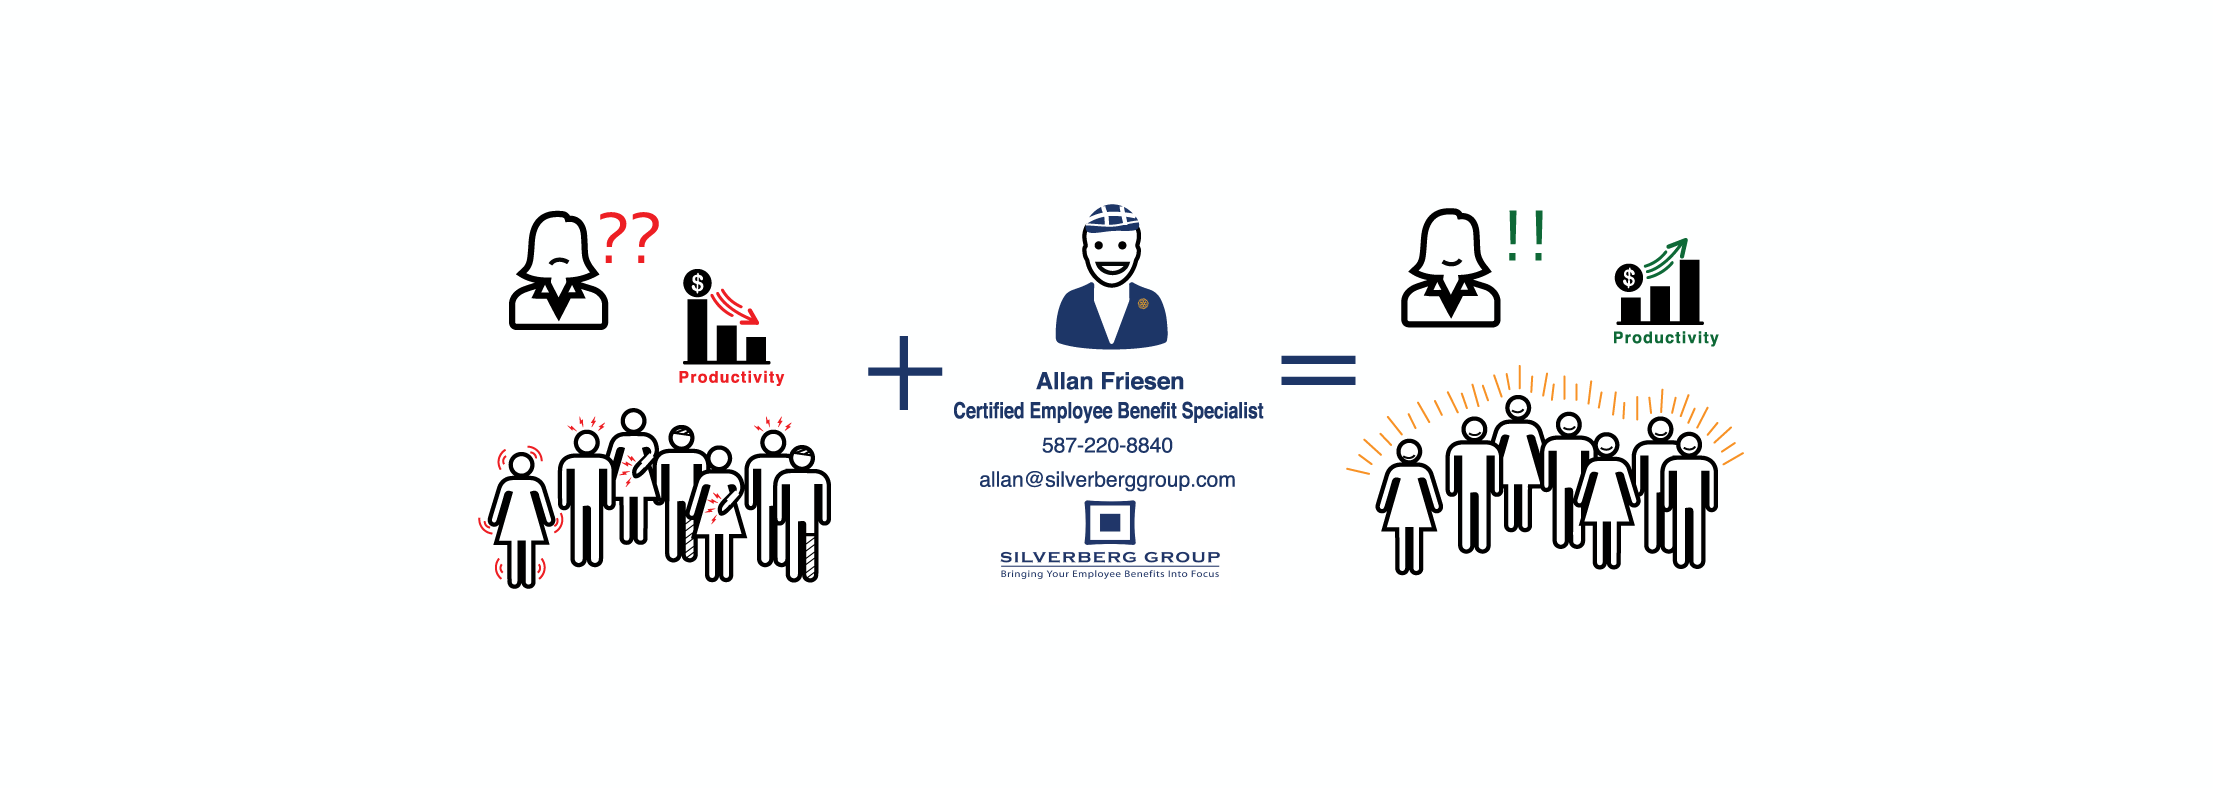 Allan Friesen | Employee Benefit Specialist | Serving Southern Alberta